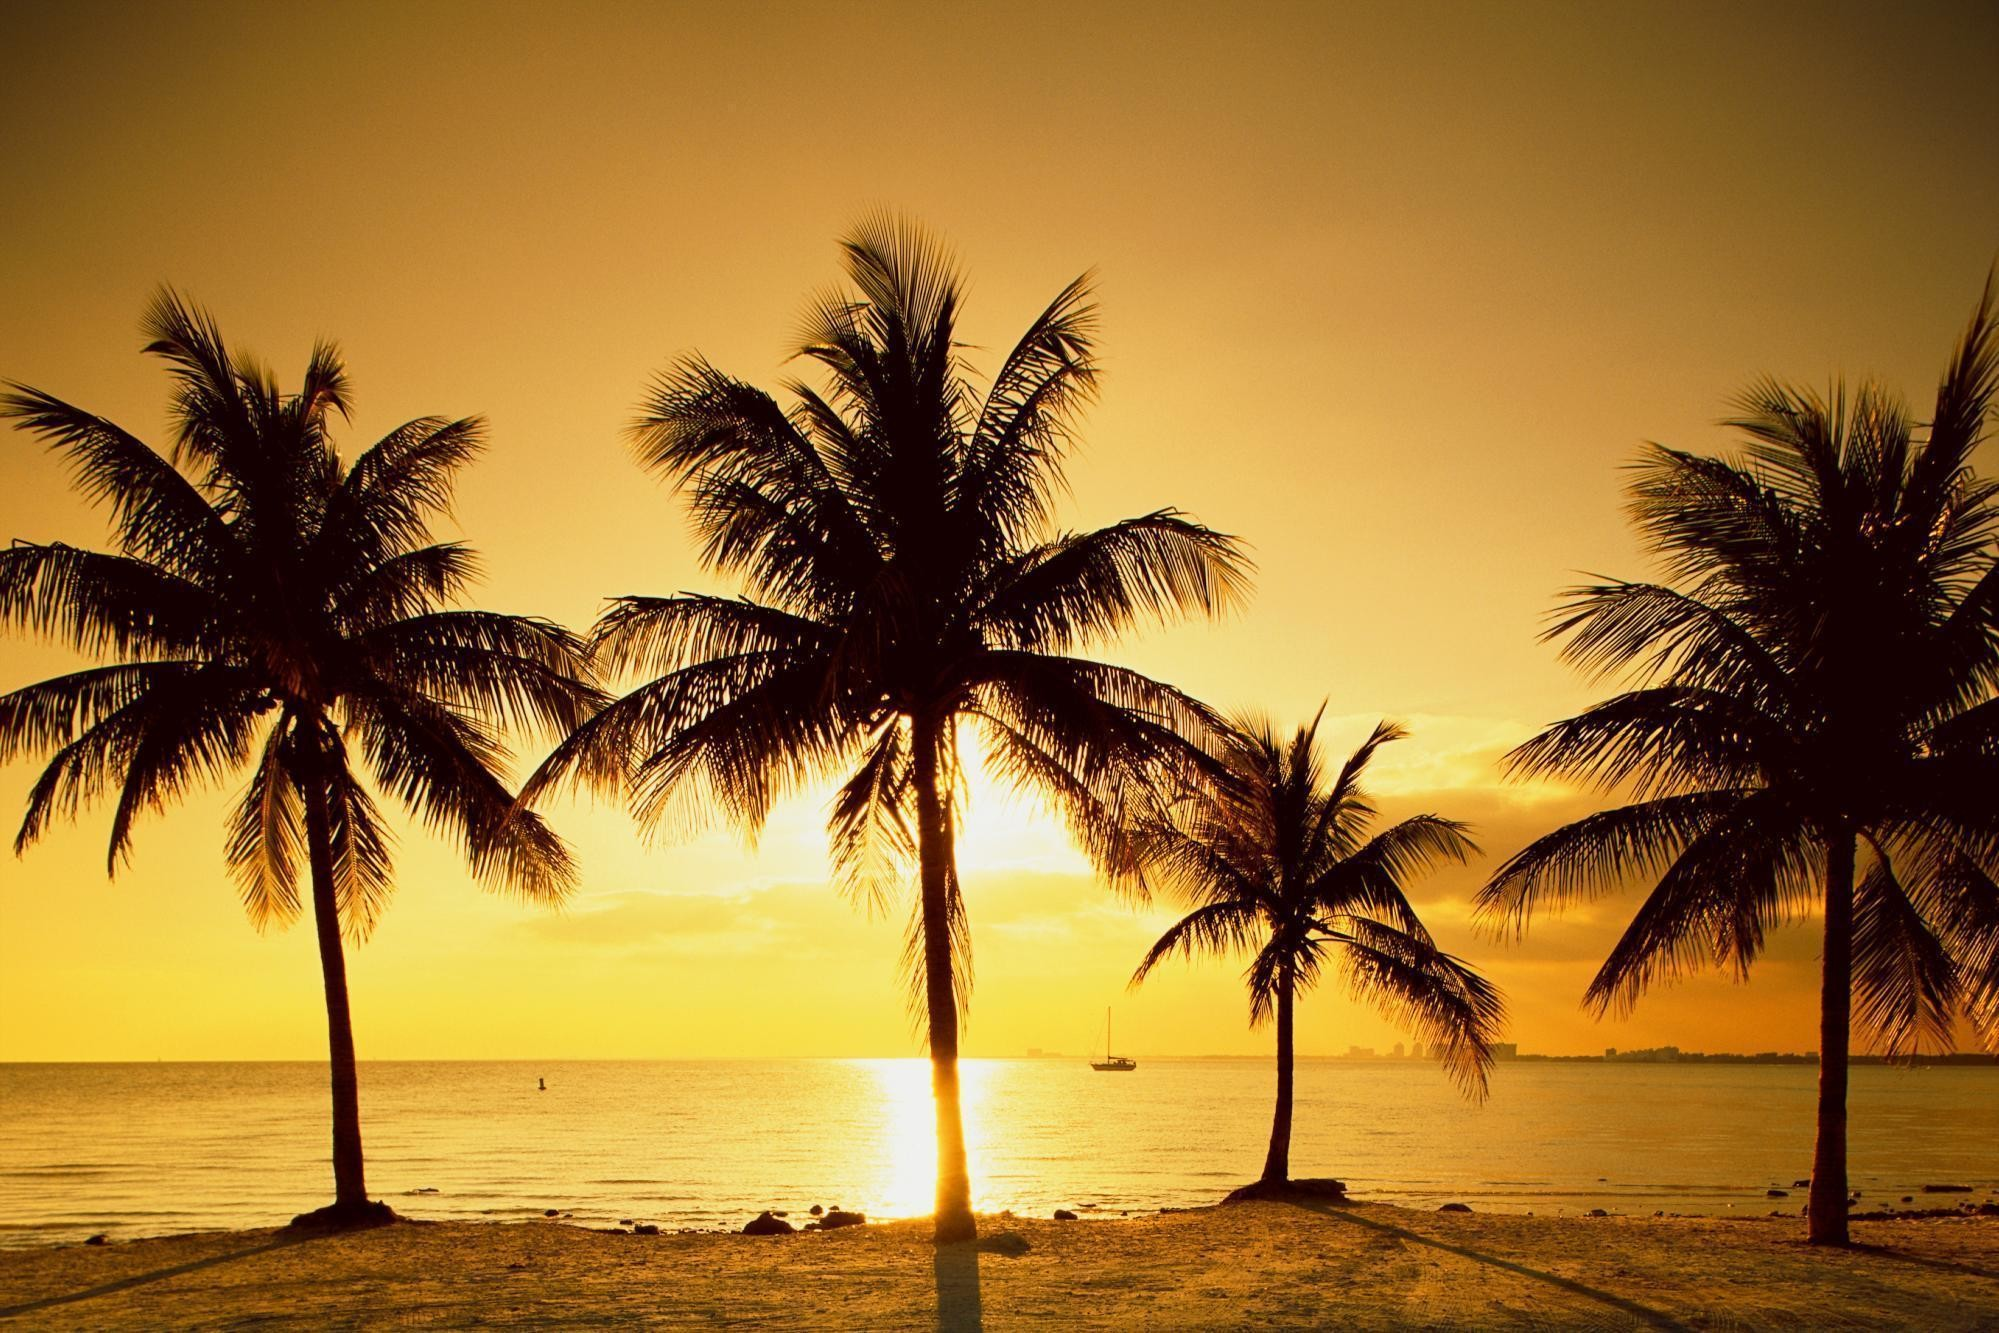 Autumn <b>Sunset Scenery Backgrounds</b> For <b>Desktop